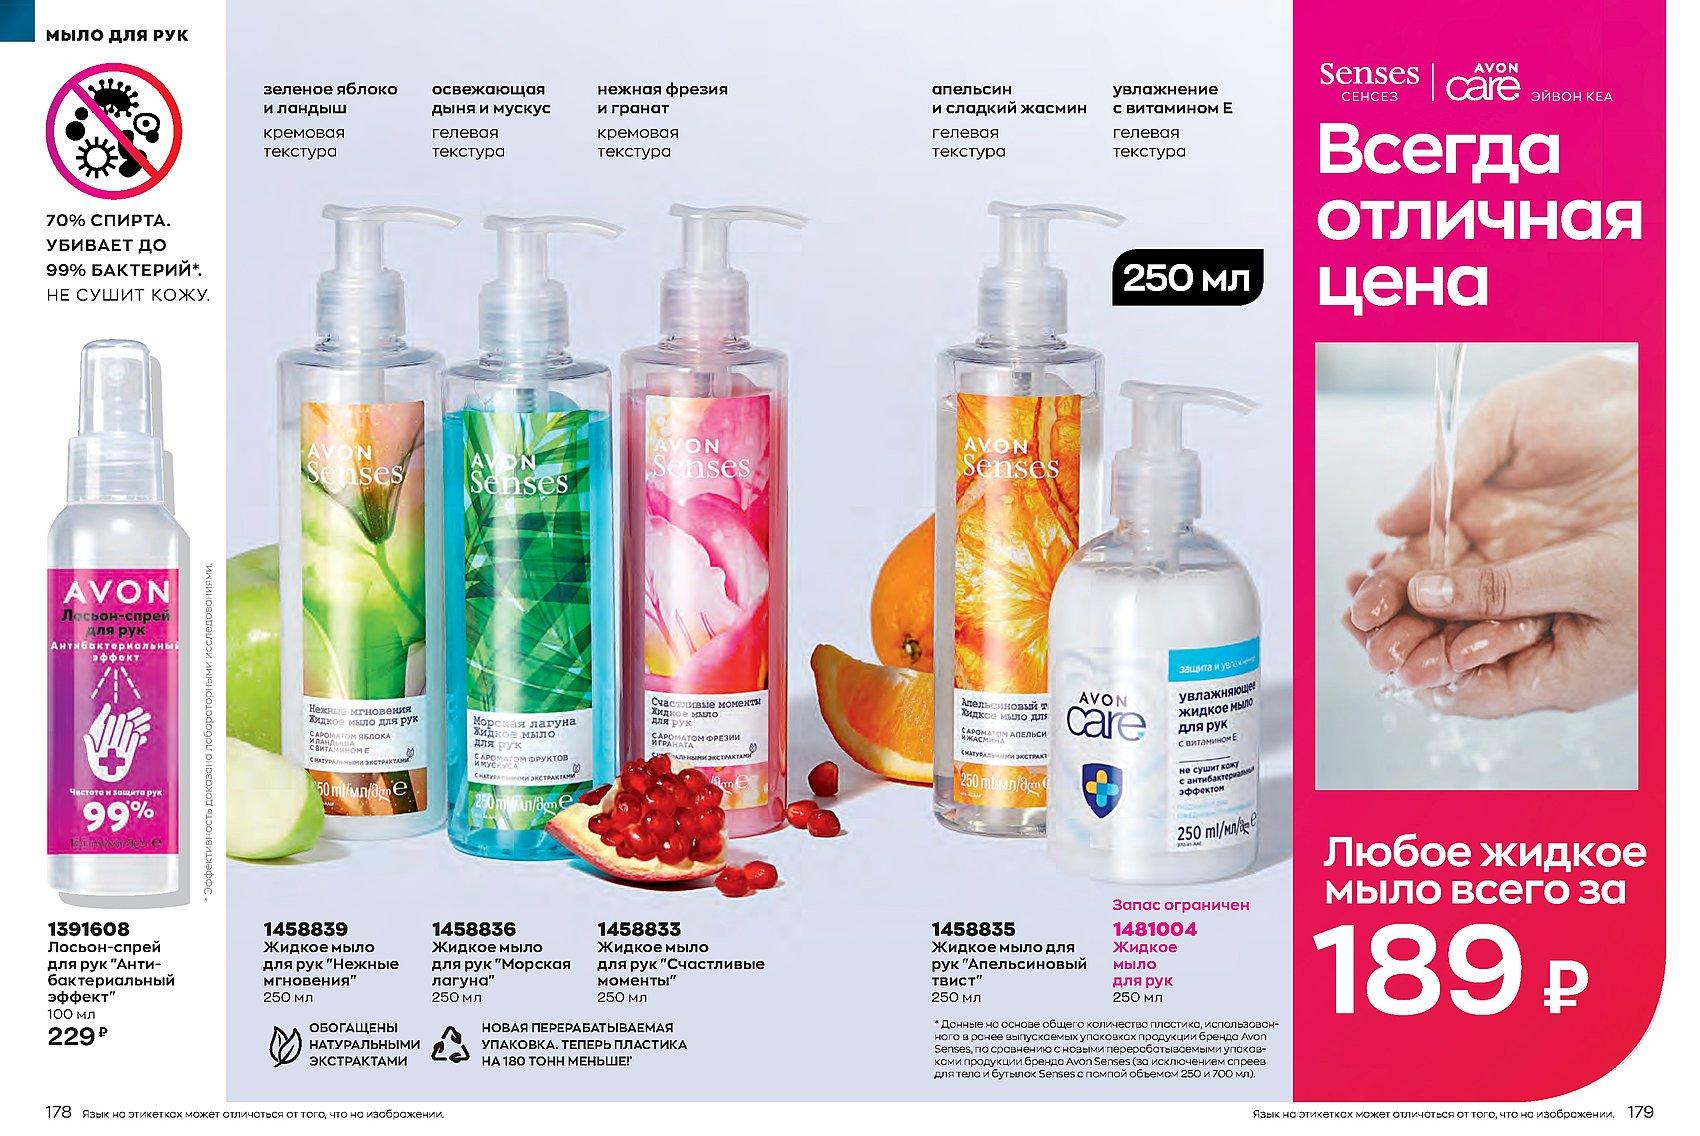 Страницы 232 - 233 каталог